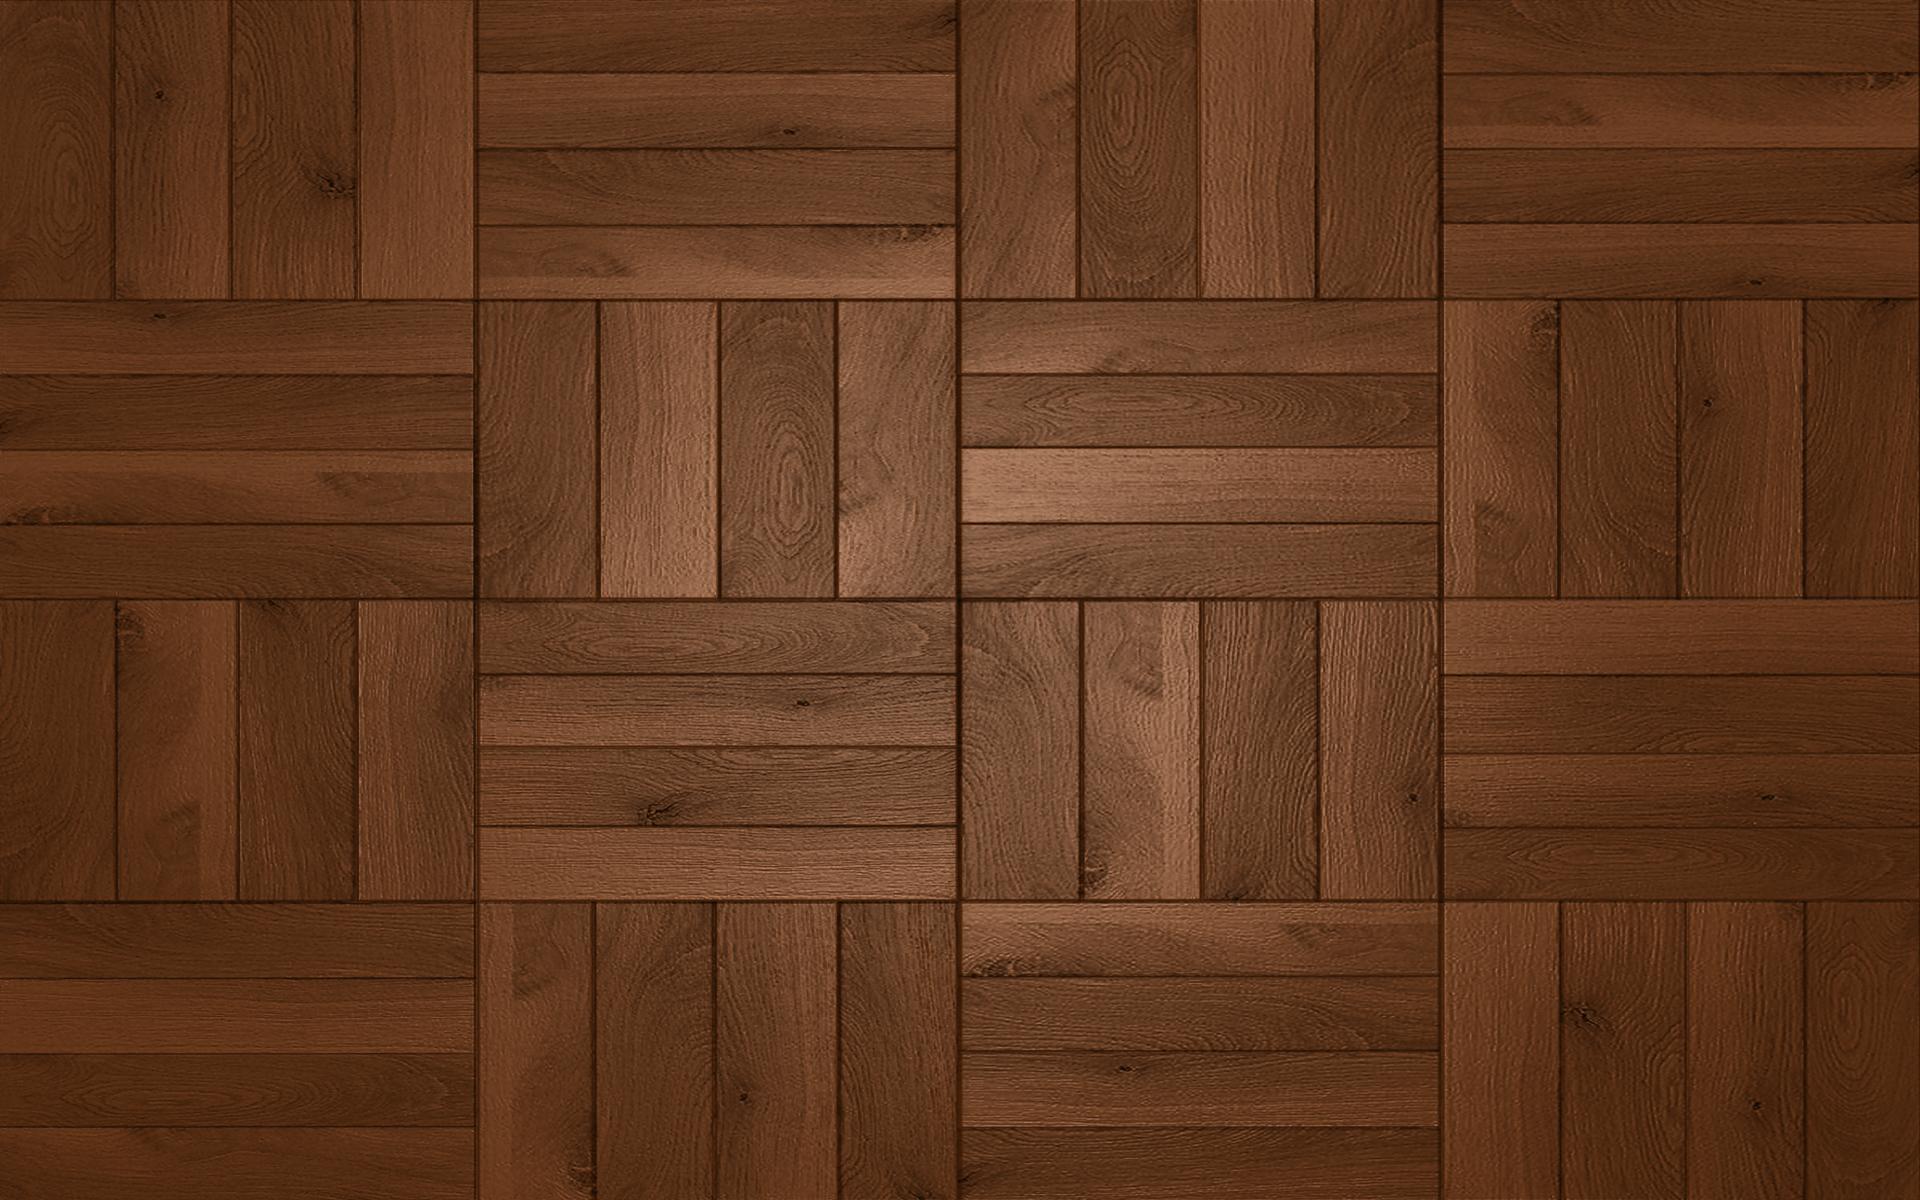 Wooden Floor Texture Psdgraphics Shoebox Dollhouse Printie Google